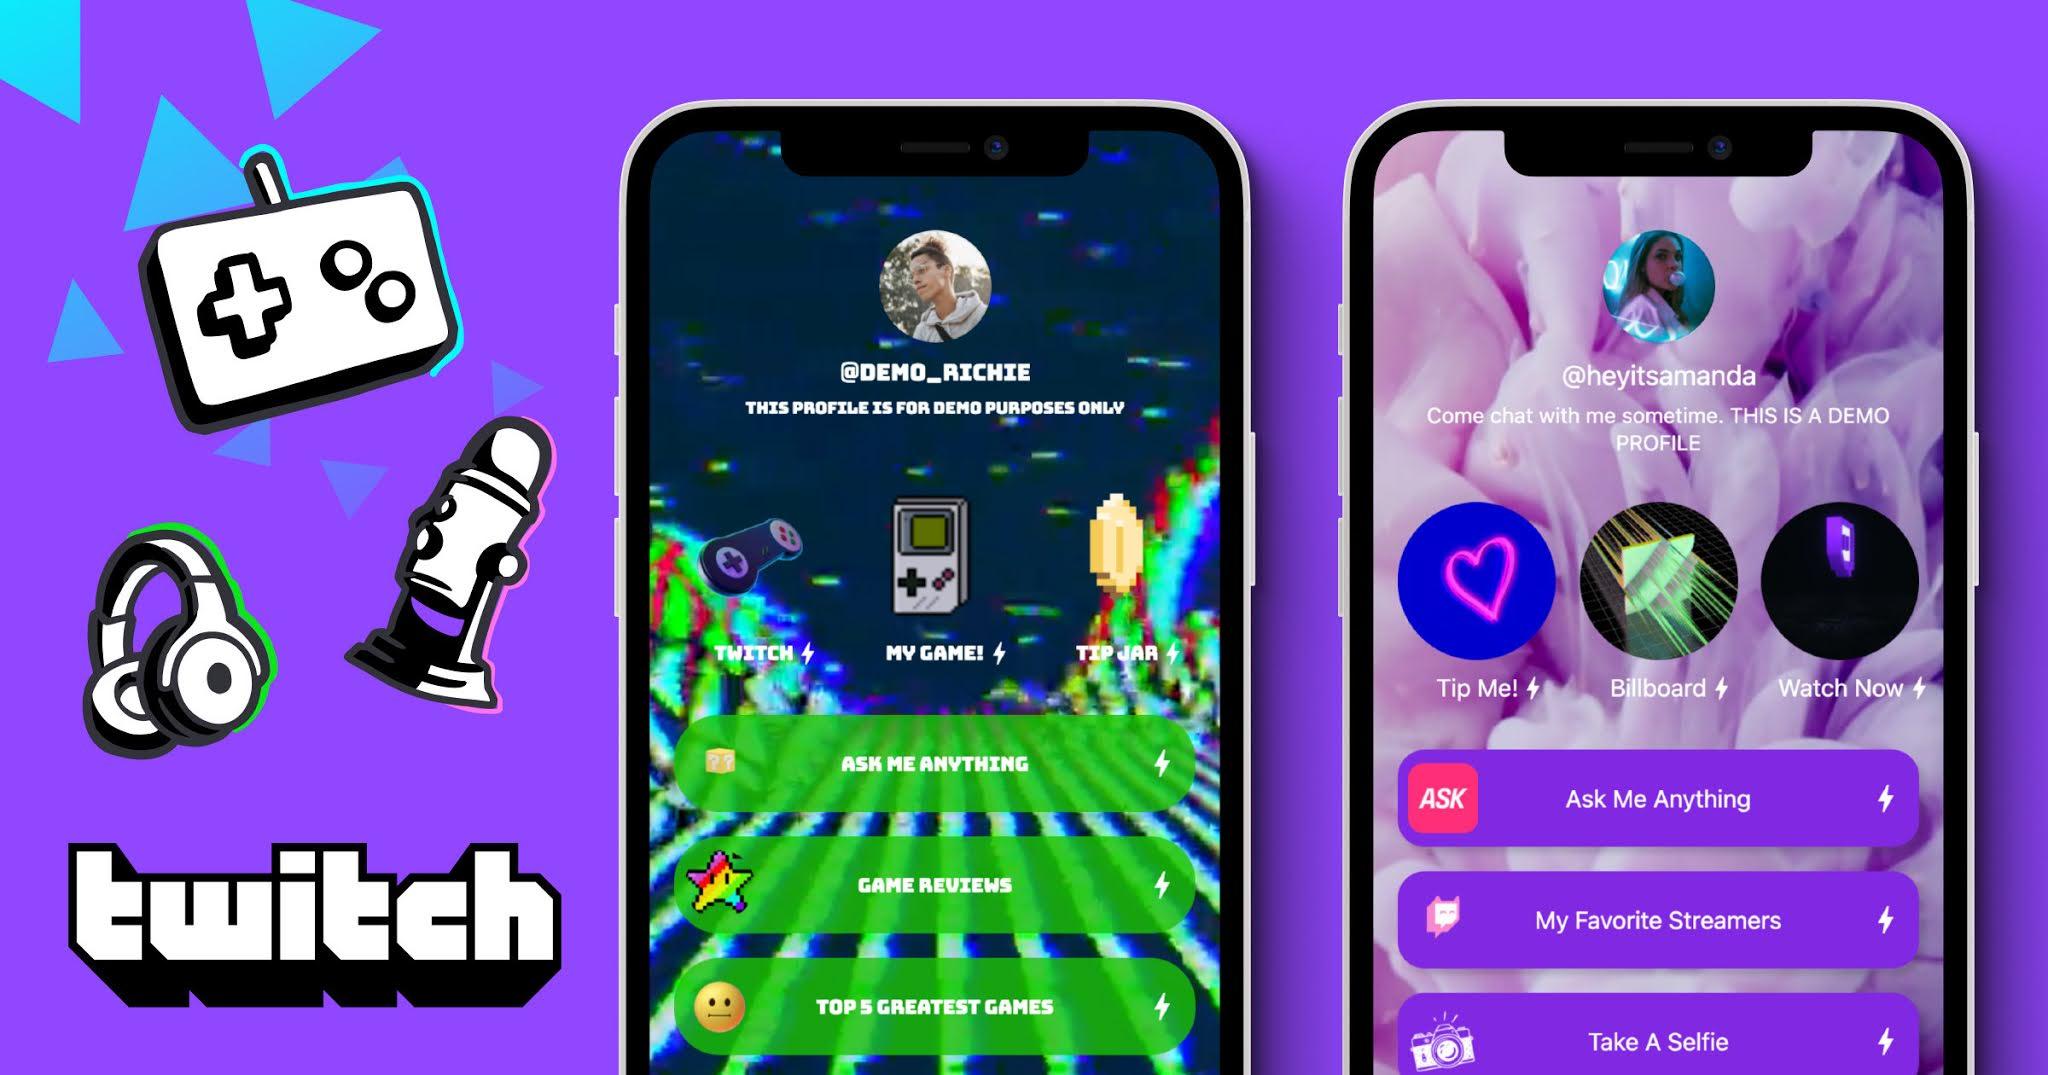 Creator Economy Platform Koji Announces New App: Twitch Stream